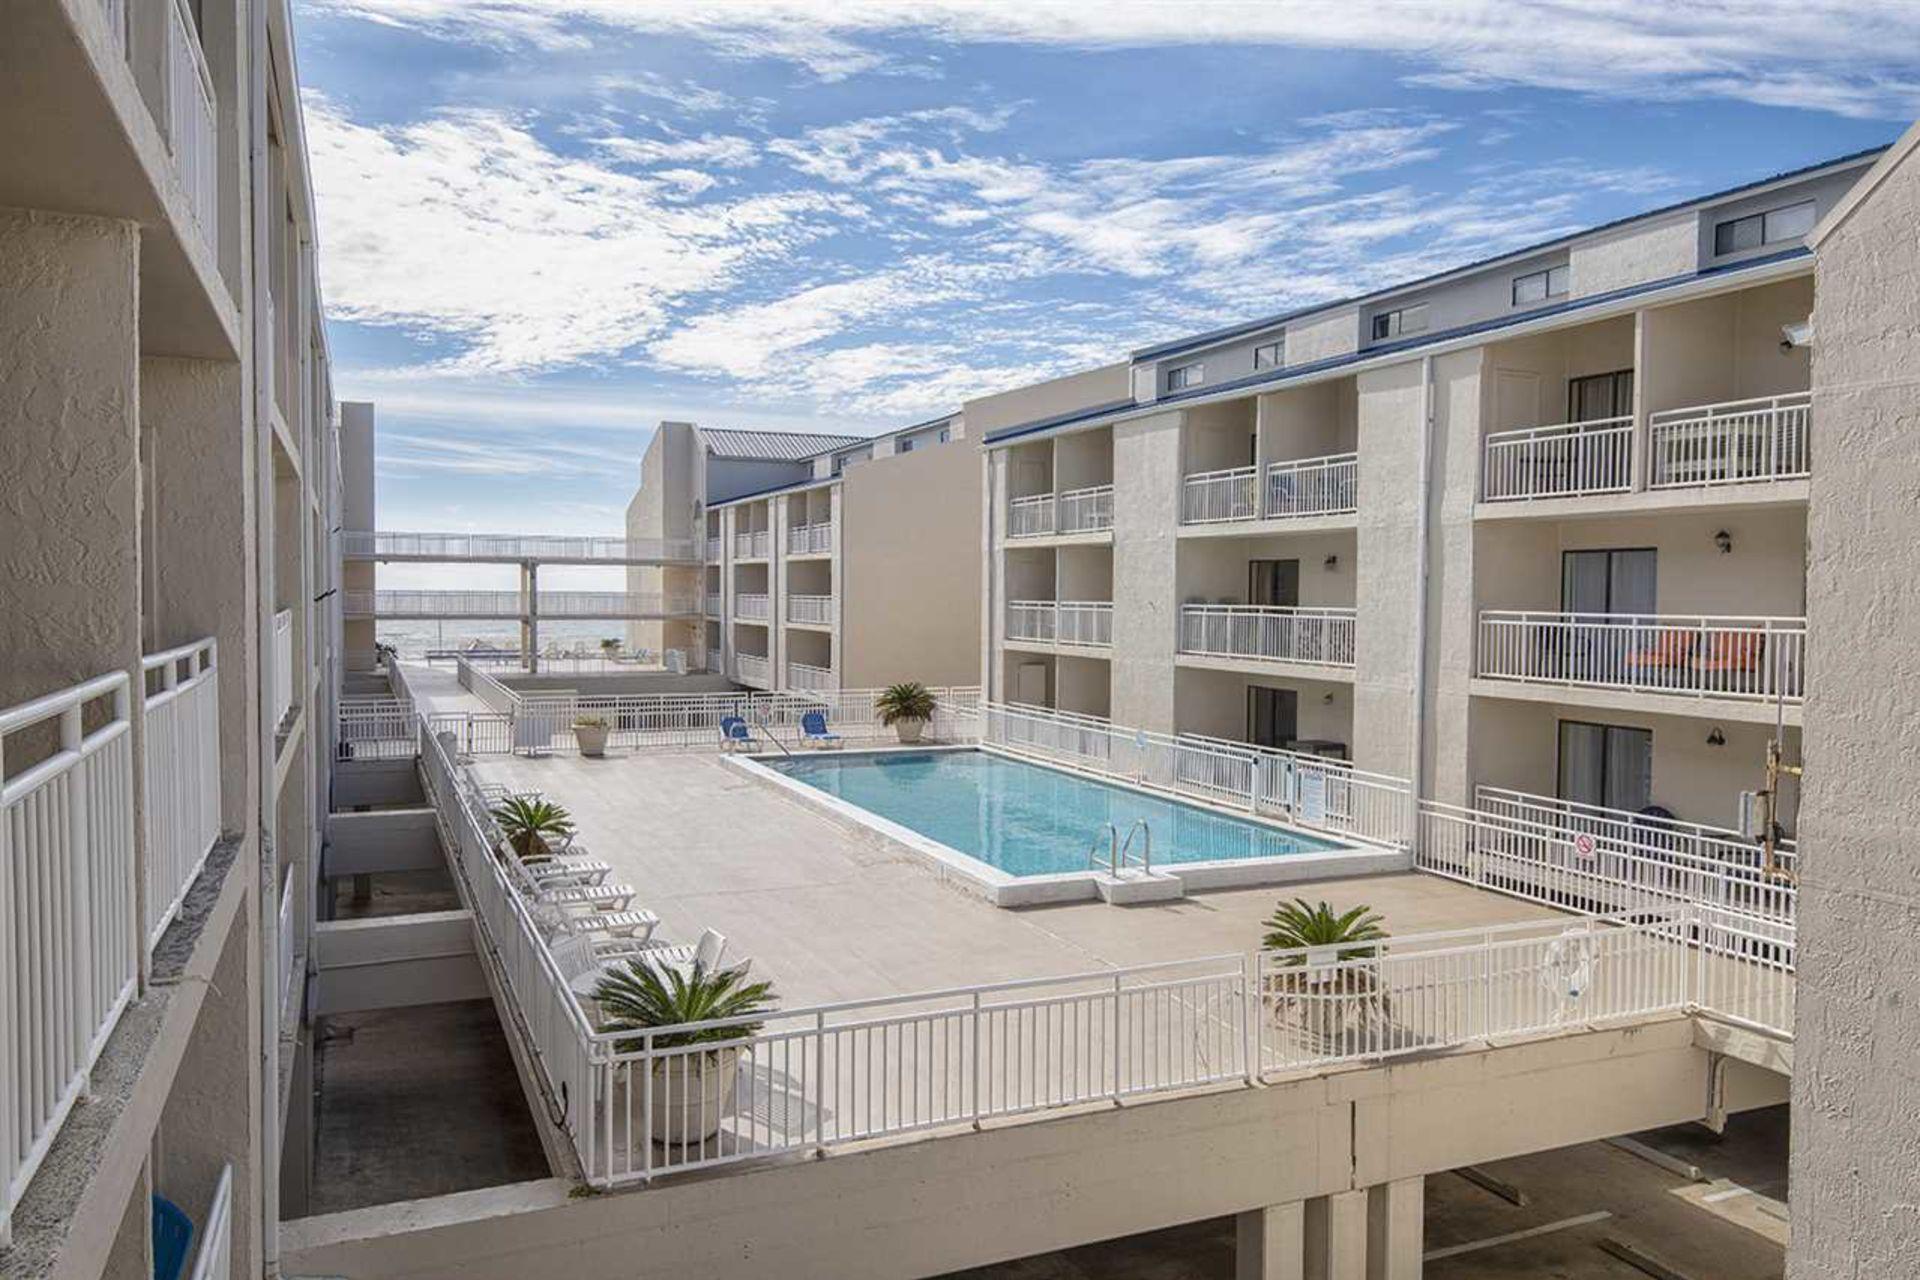 Orange Beach Condos from $100,000 to $200,000